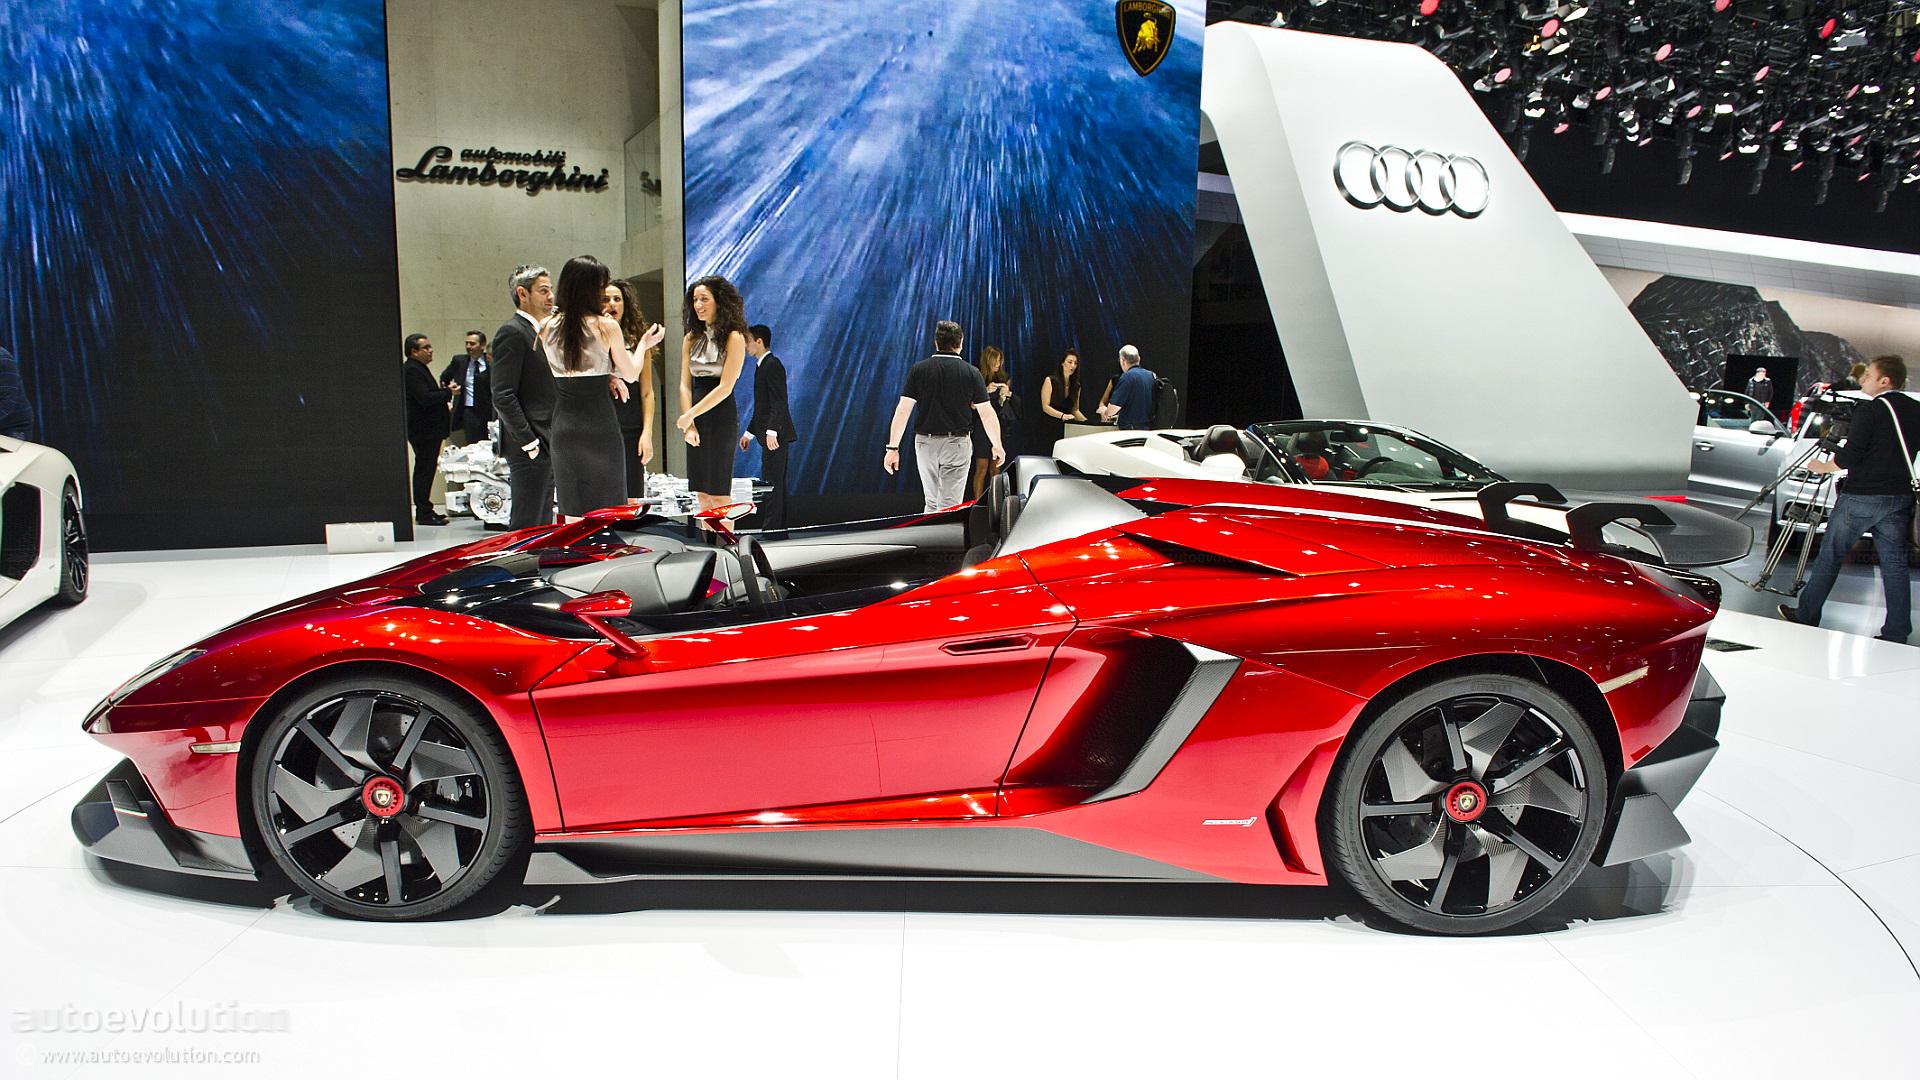 Lamborghini Aventador J Was An Internet Hit Autoevolution